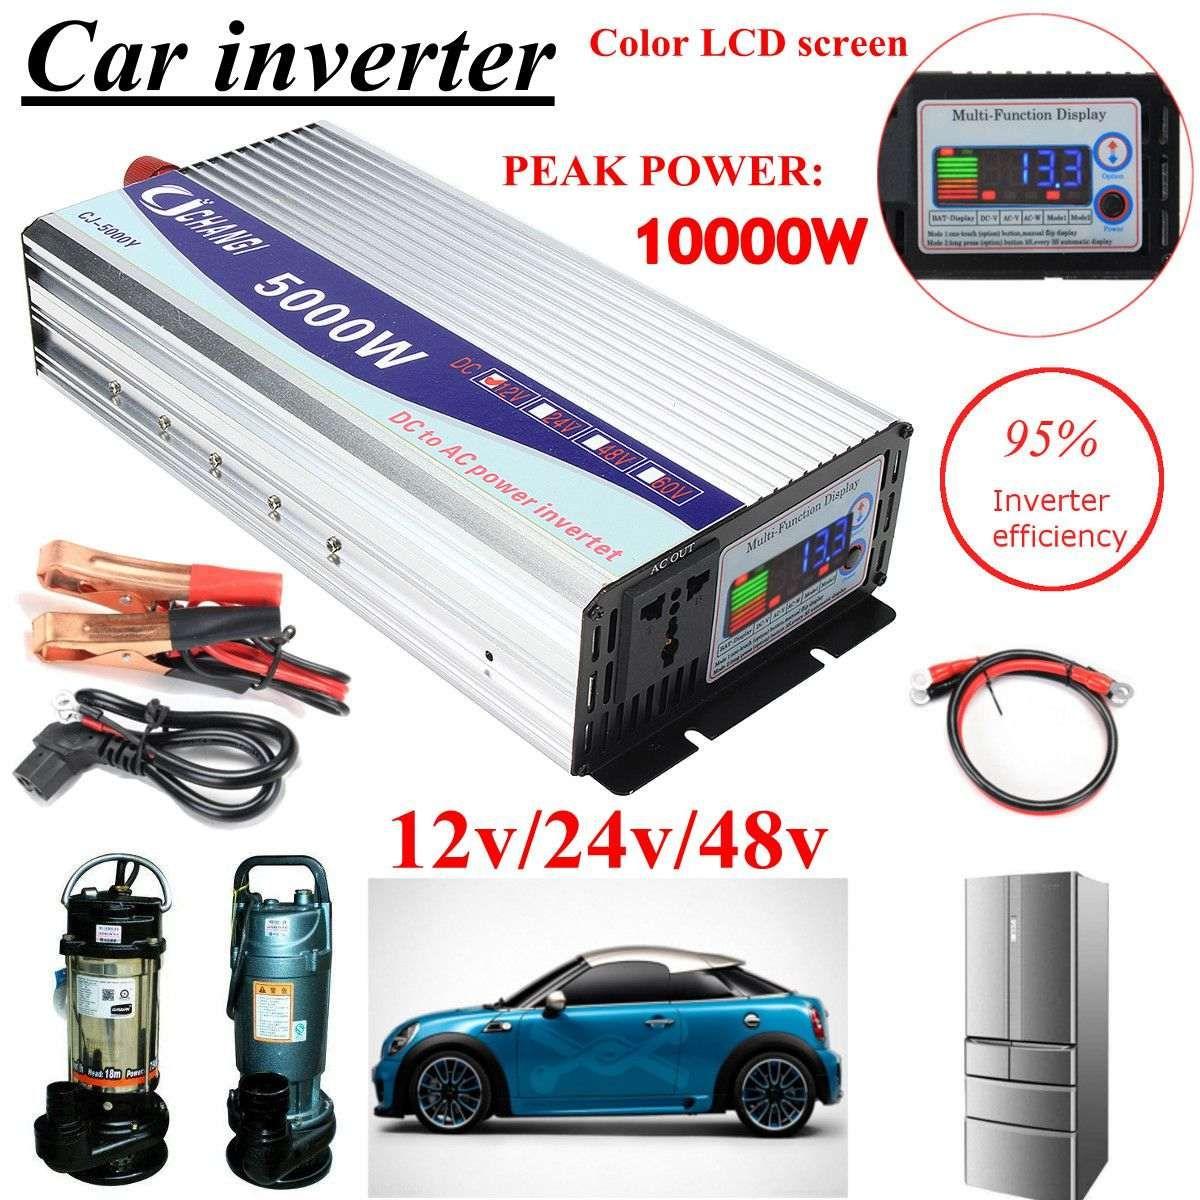 Inverter 12V/24V/48V 220V 5000W 10000W Peak- Modified Sine Wave Power Voltage transformer Inverter Converter + LCD display